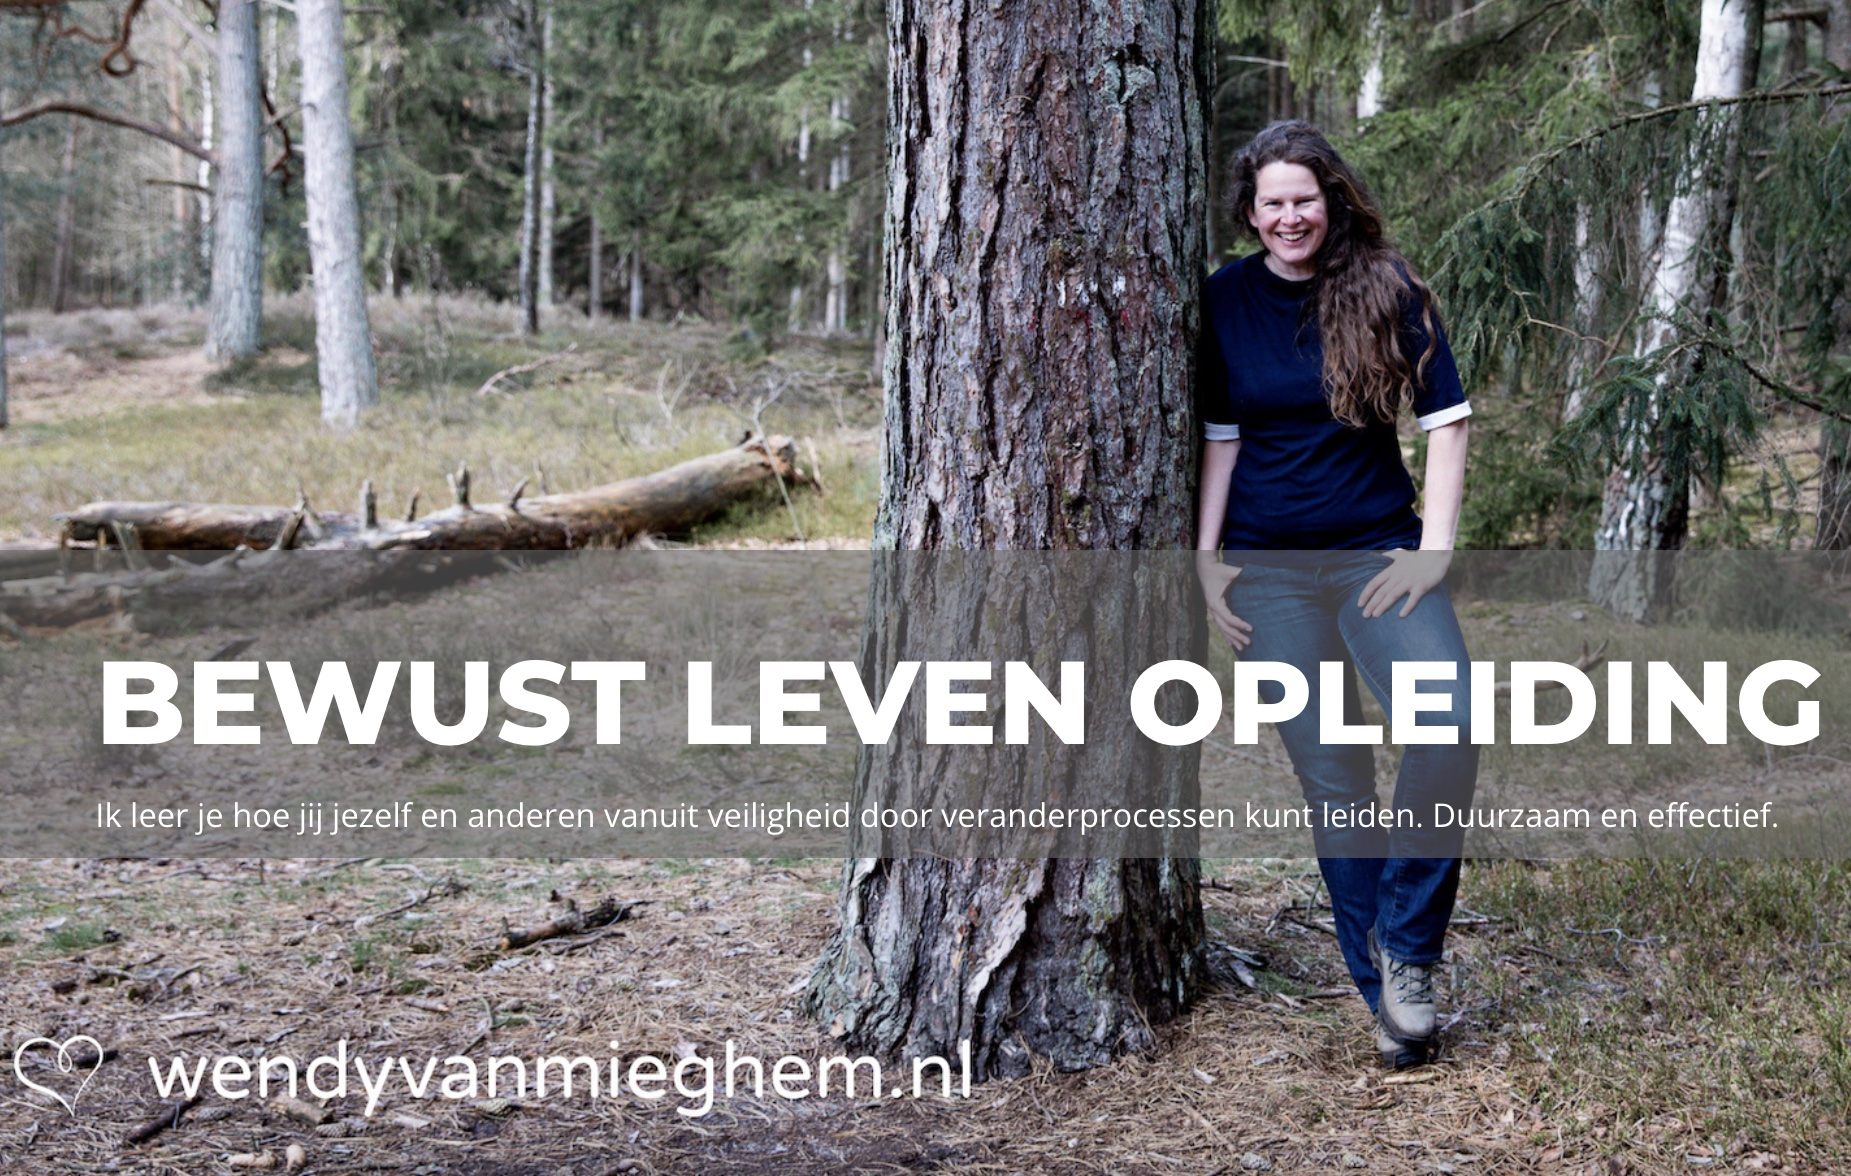 Bewust Leven Opleiding - Wendyvanmieghem.nl